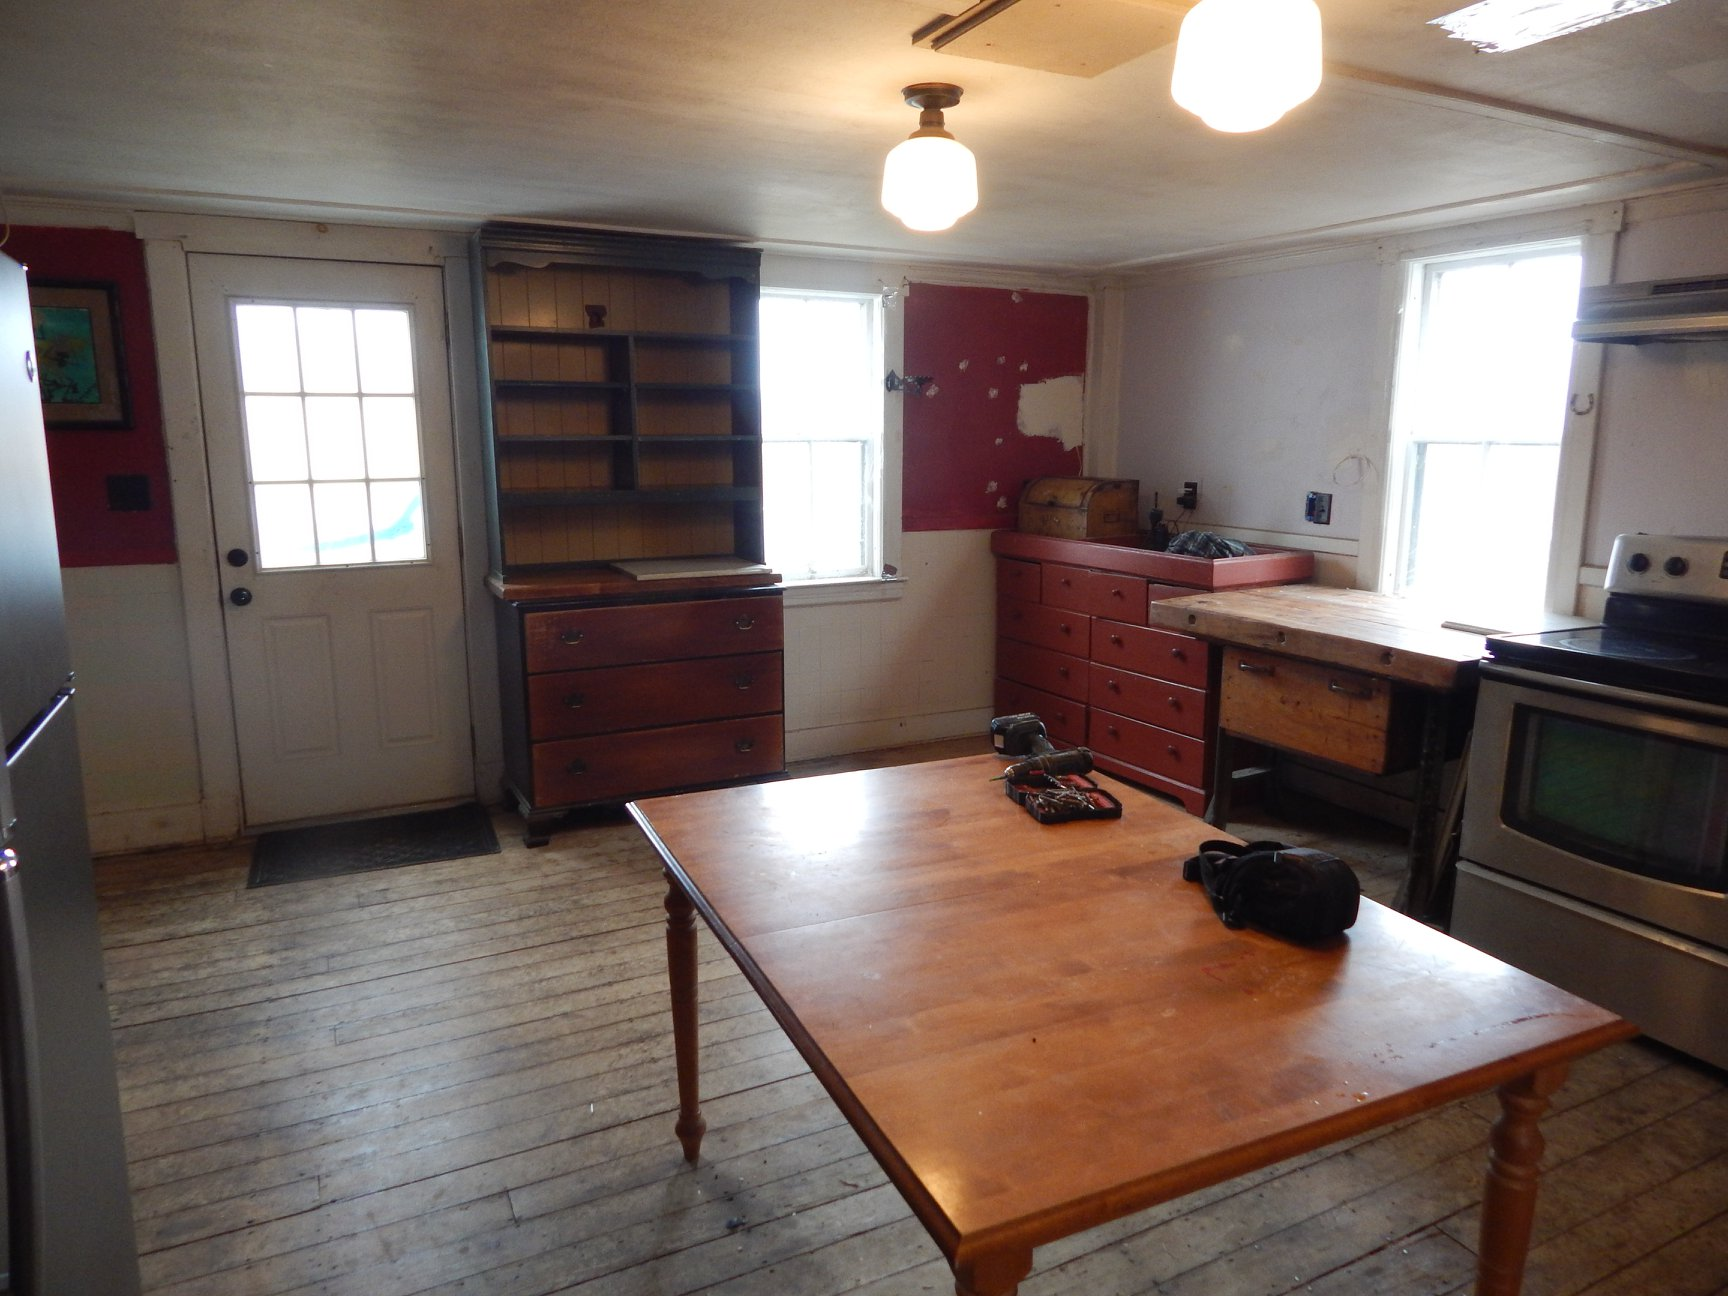 kitchen pre-reno